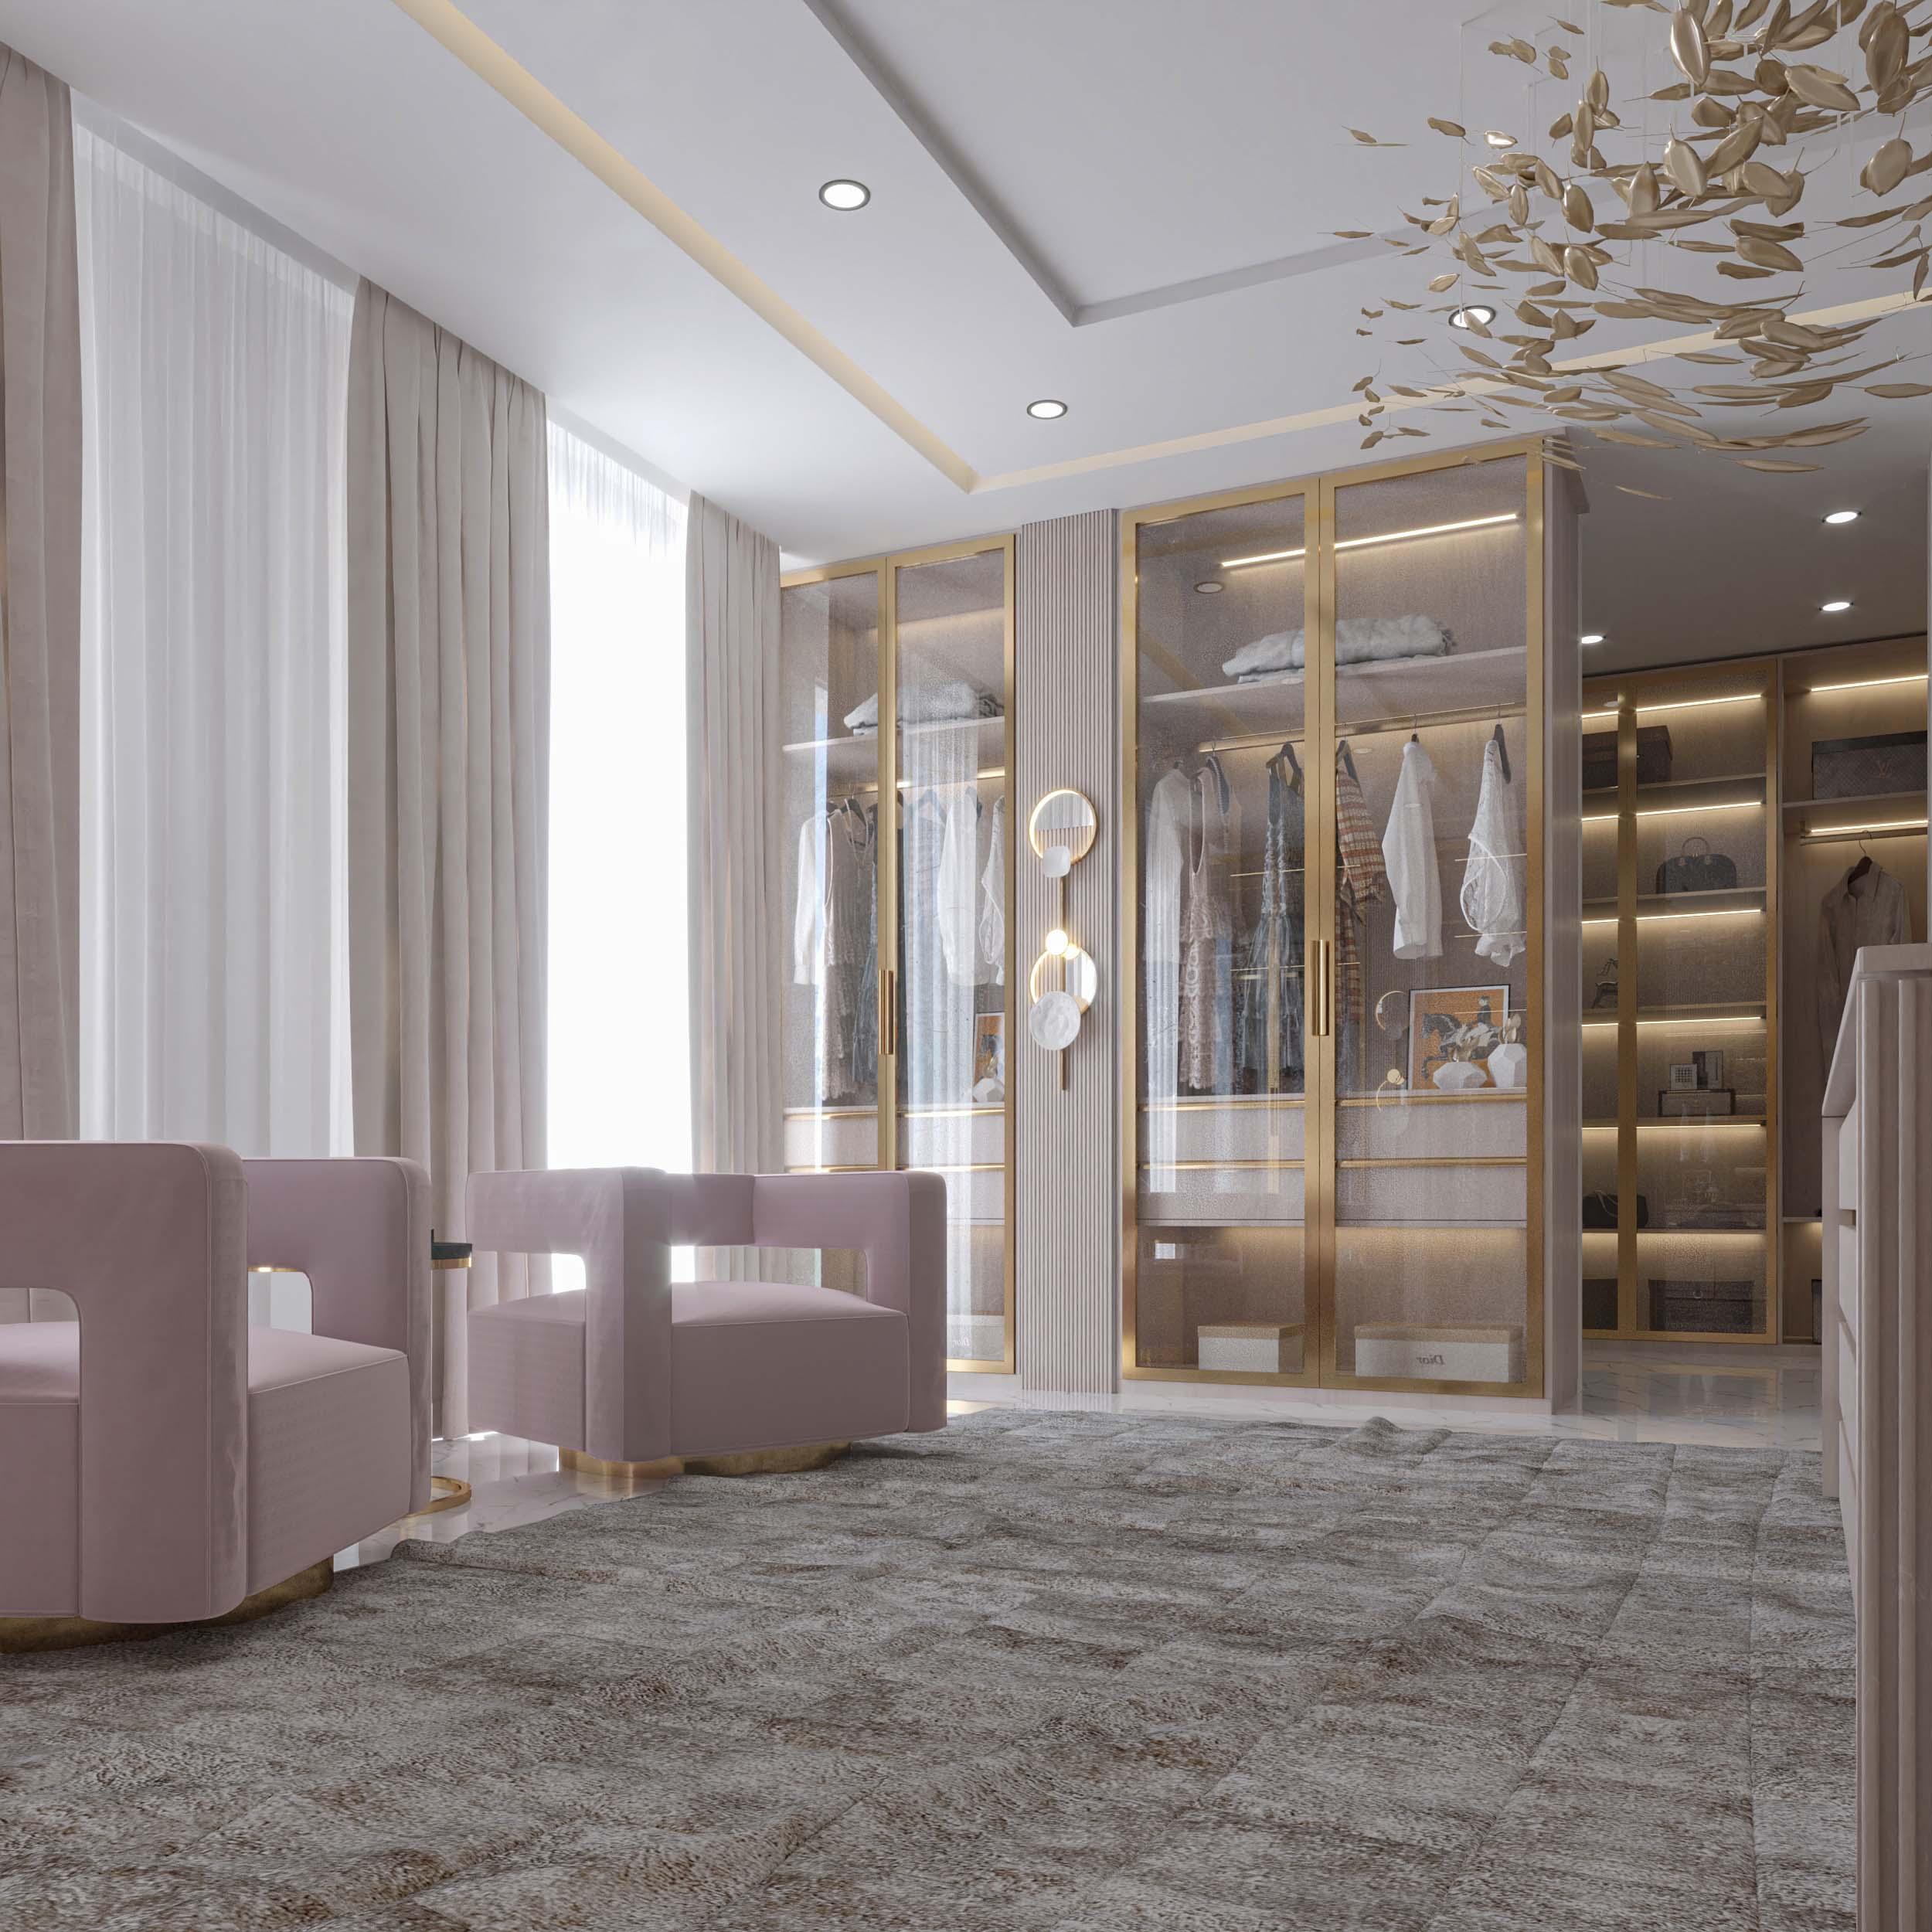 dressing room designs - light work